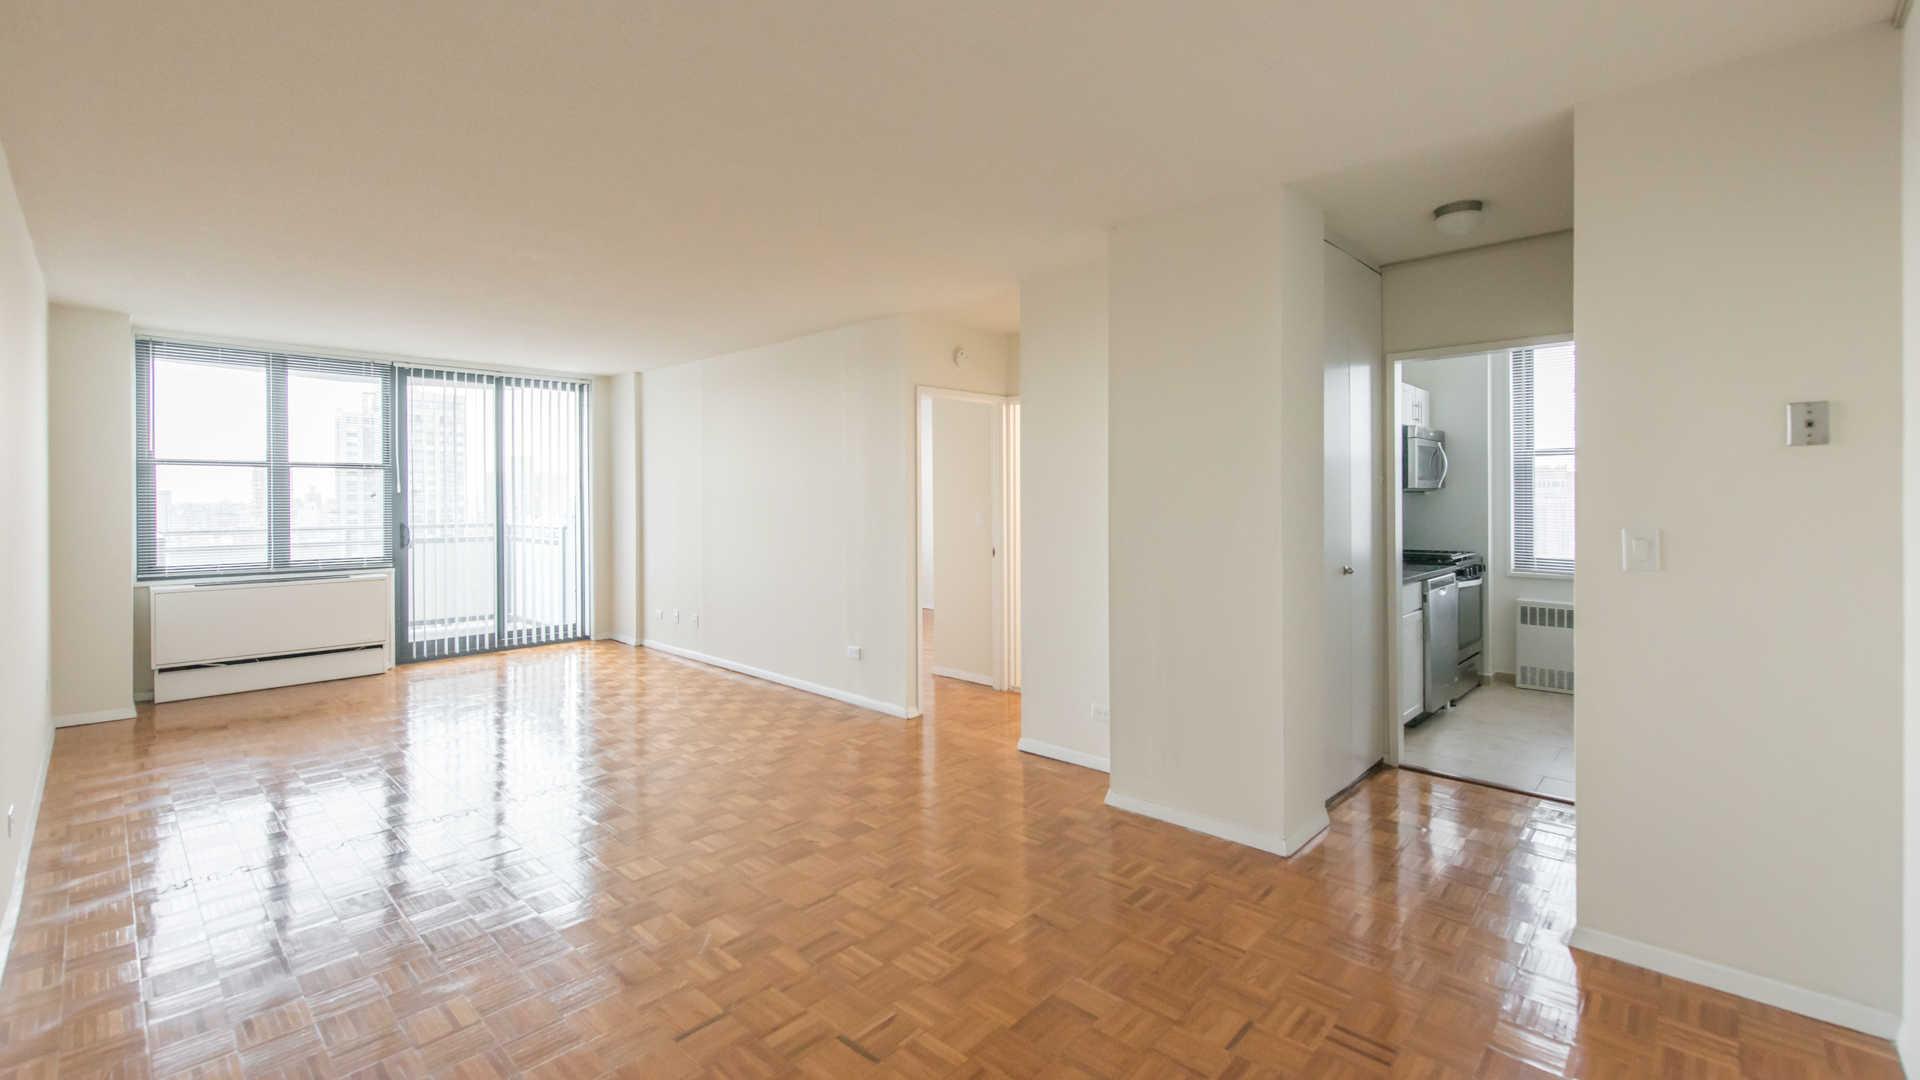 Living Room with Wood Parquet Floor